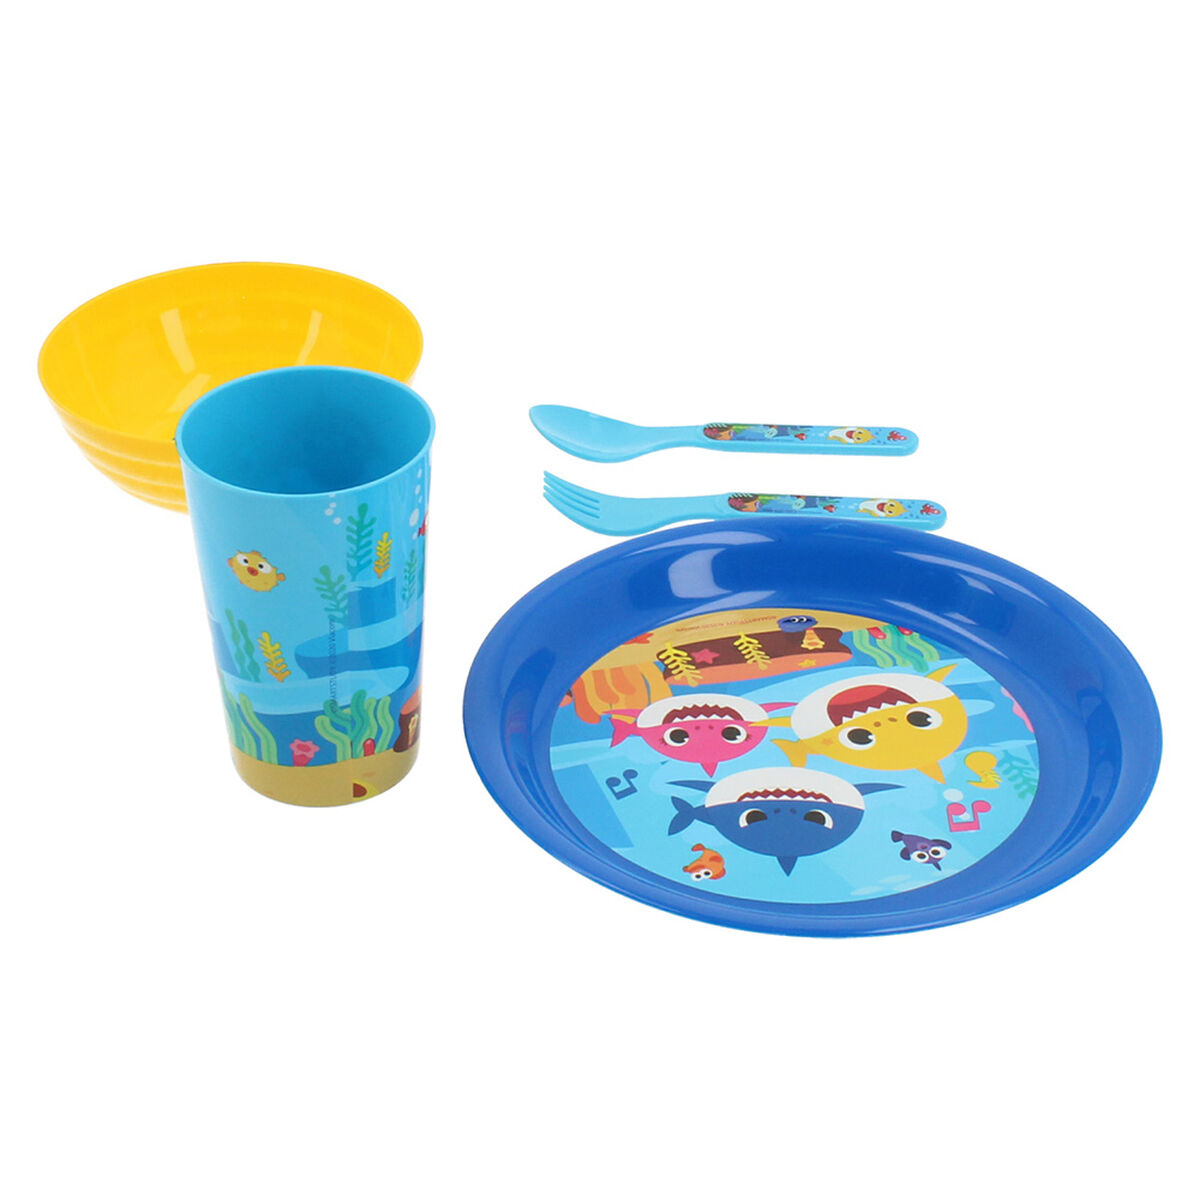 Set 5 Piezas Vajilla Infantil Baby Shark Celeste